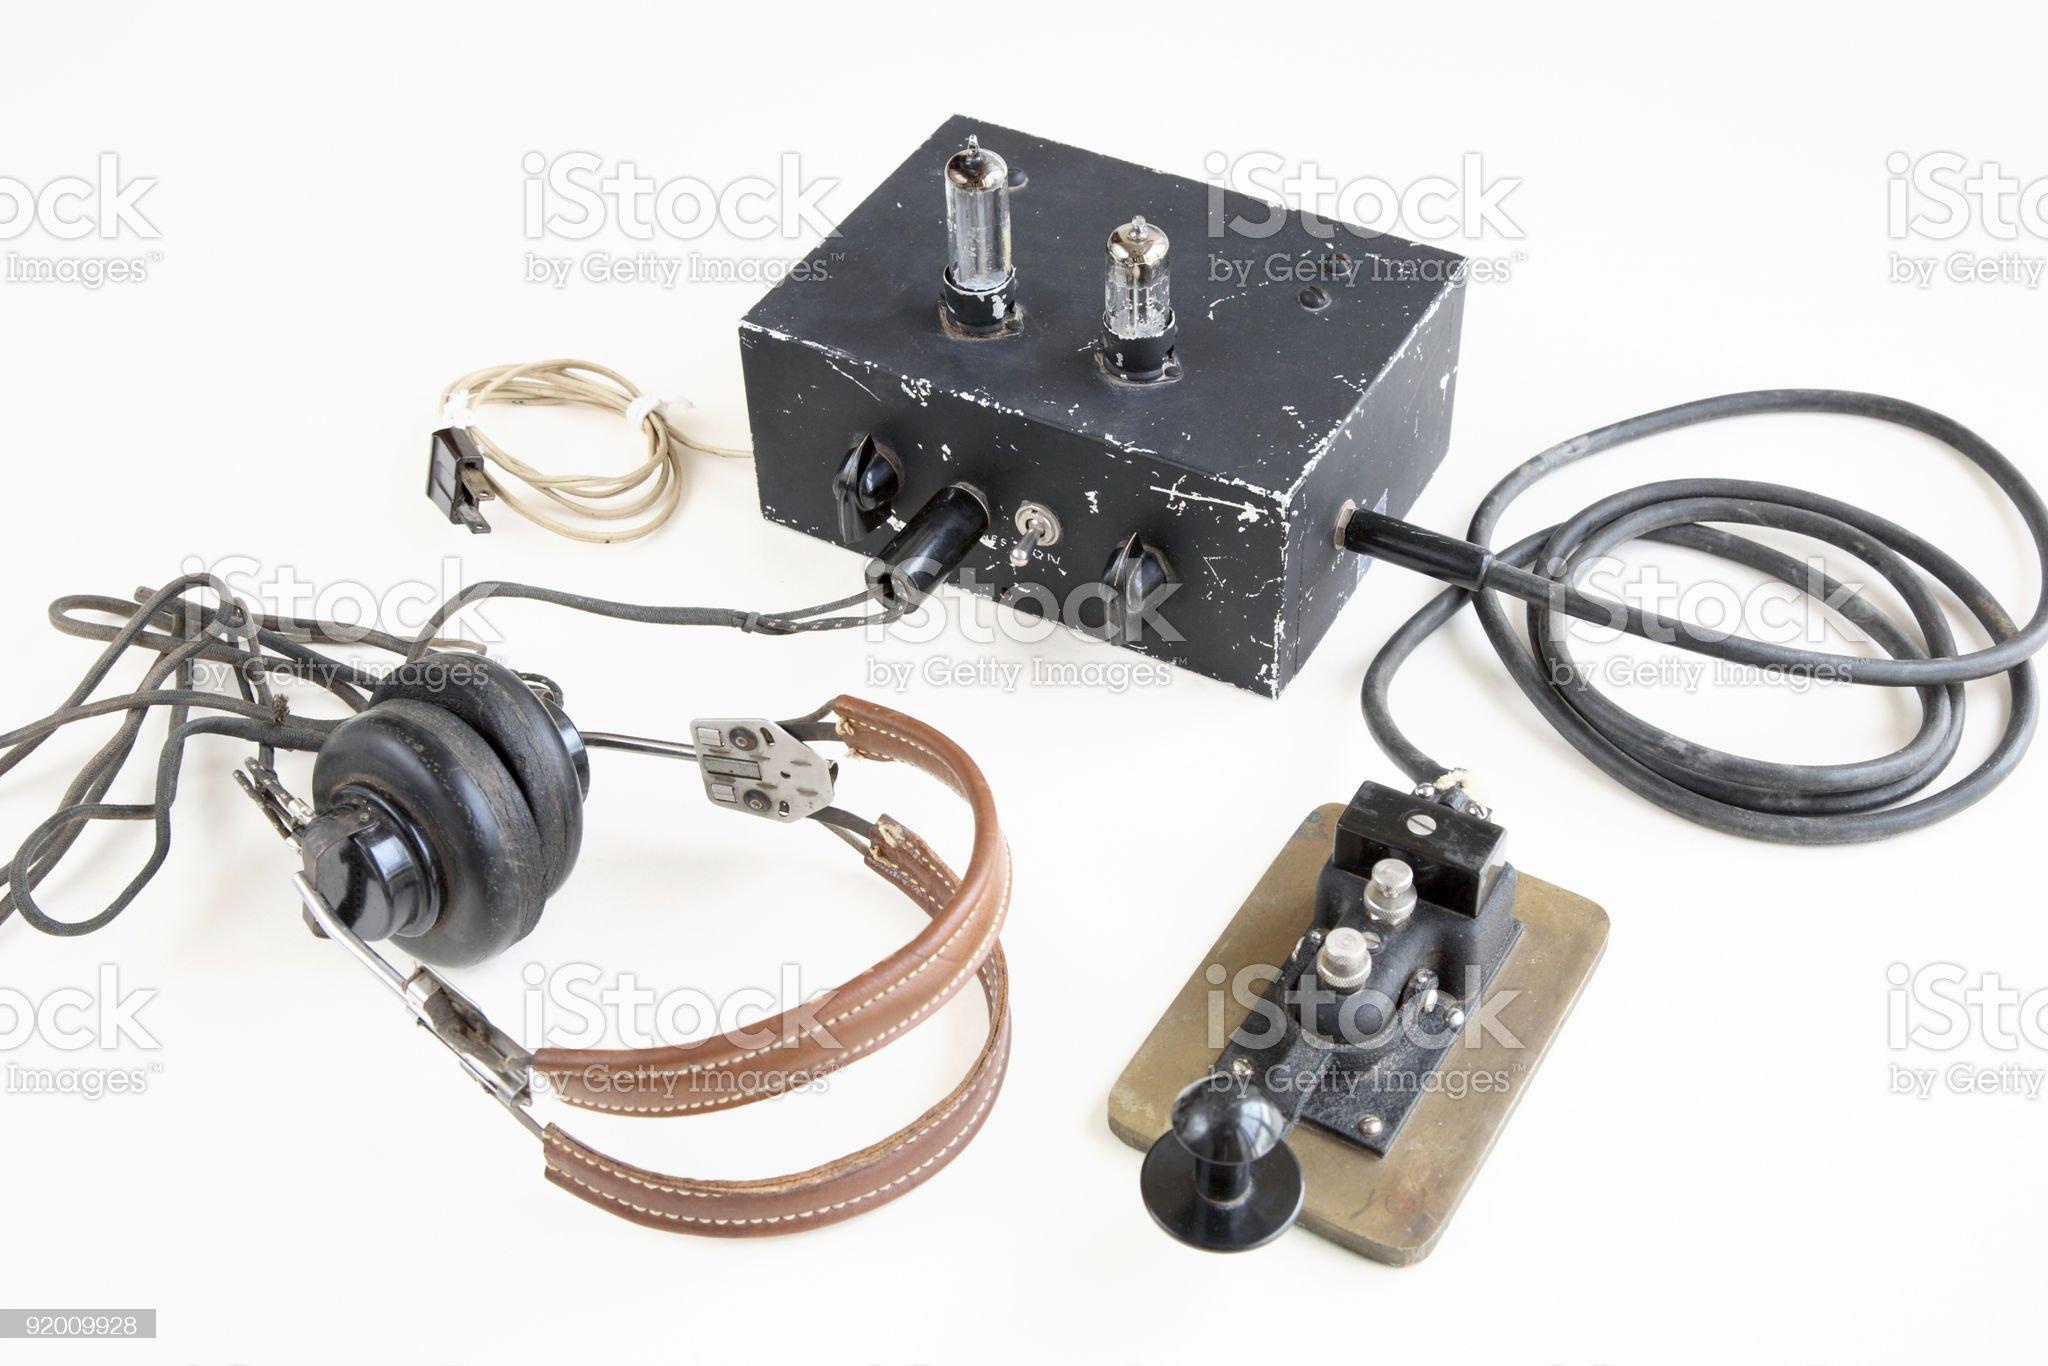 Vintage Electronics royalty-free stock photo